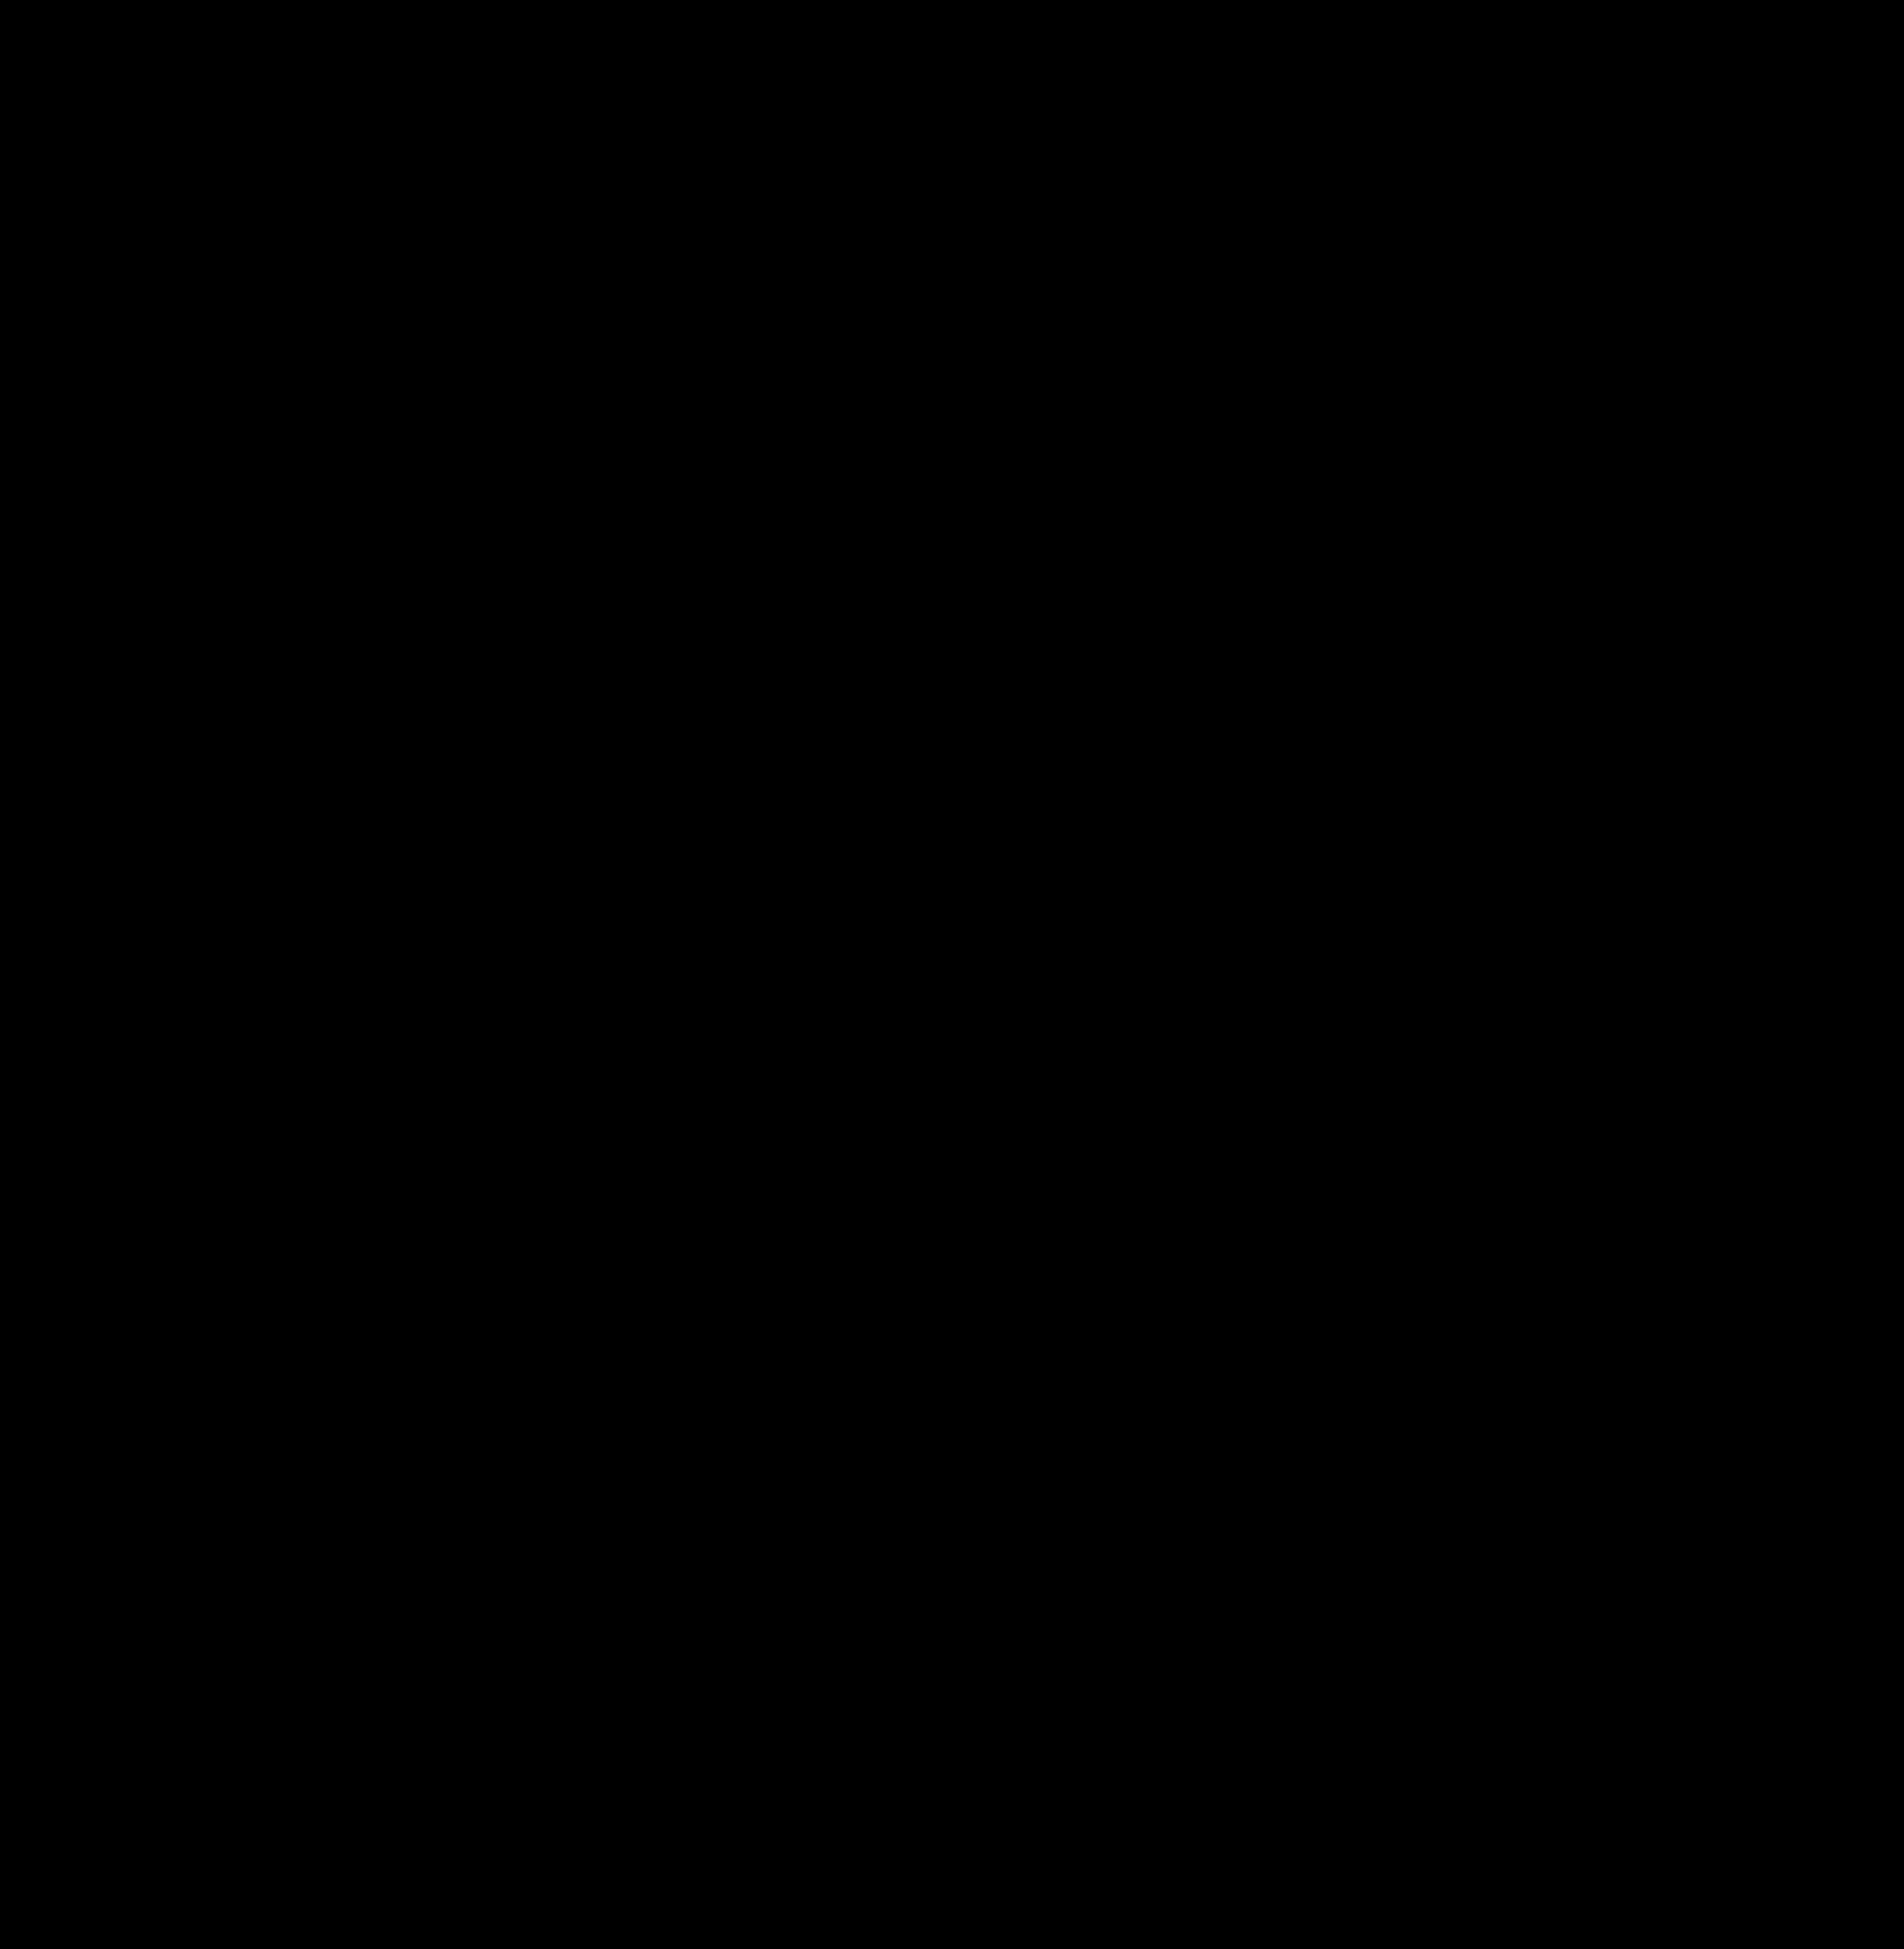 2344x2400 Clipart